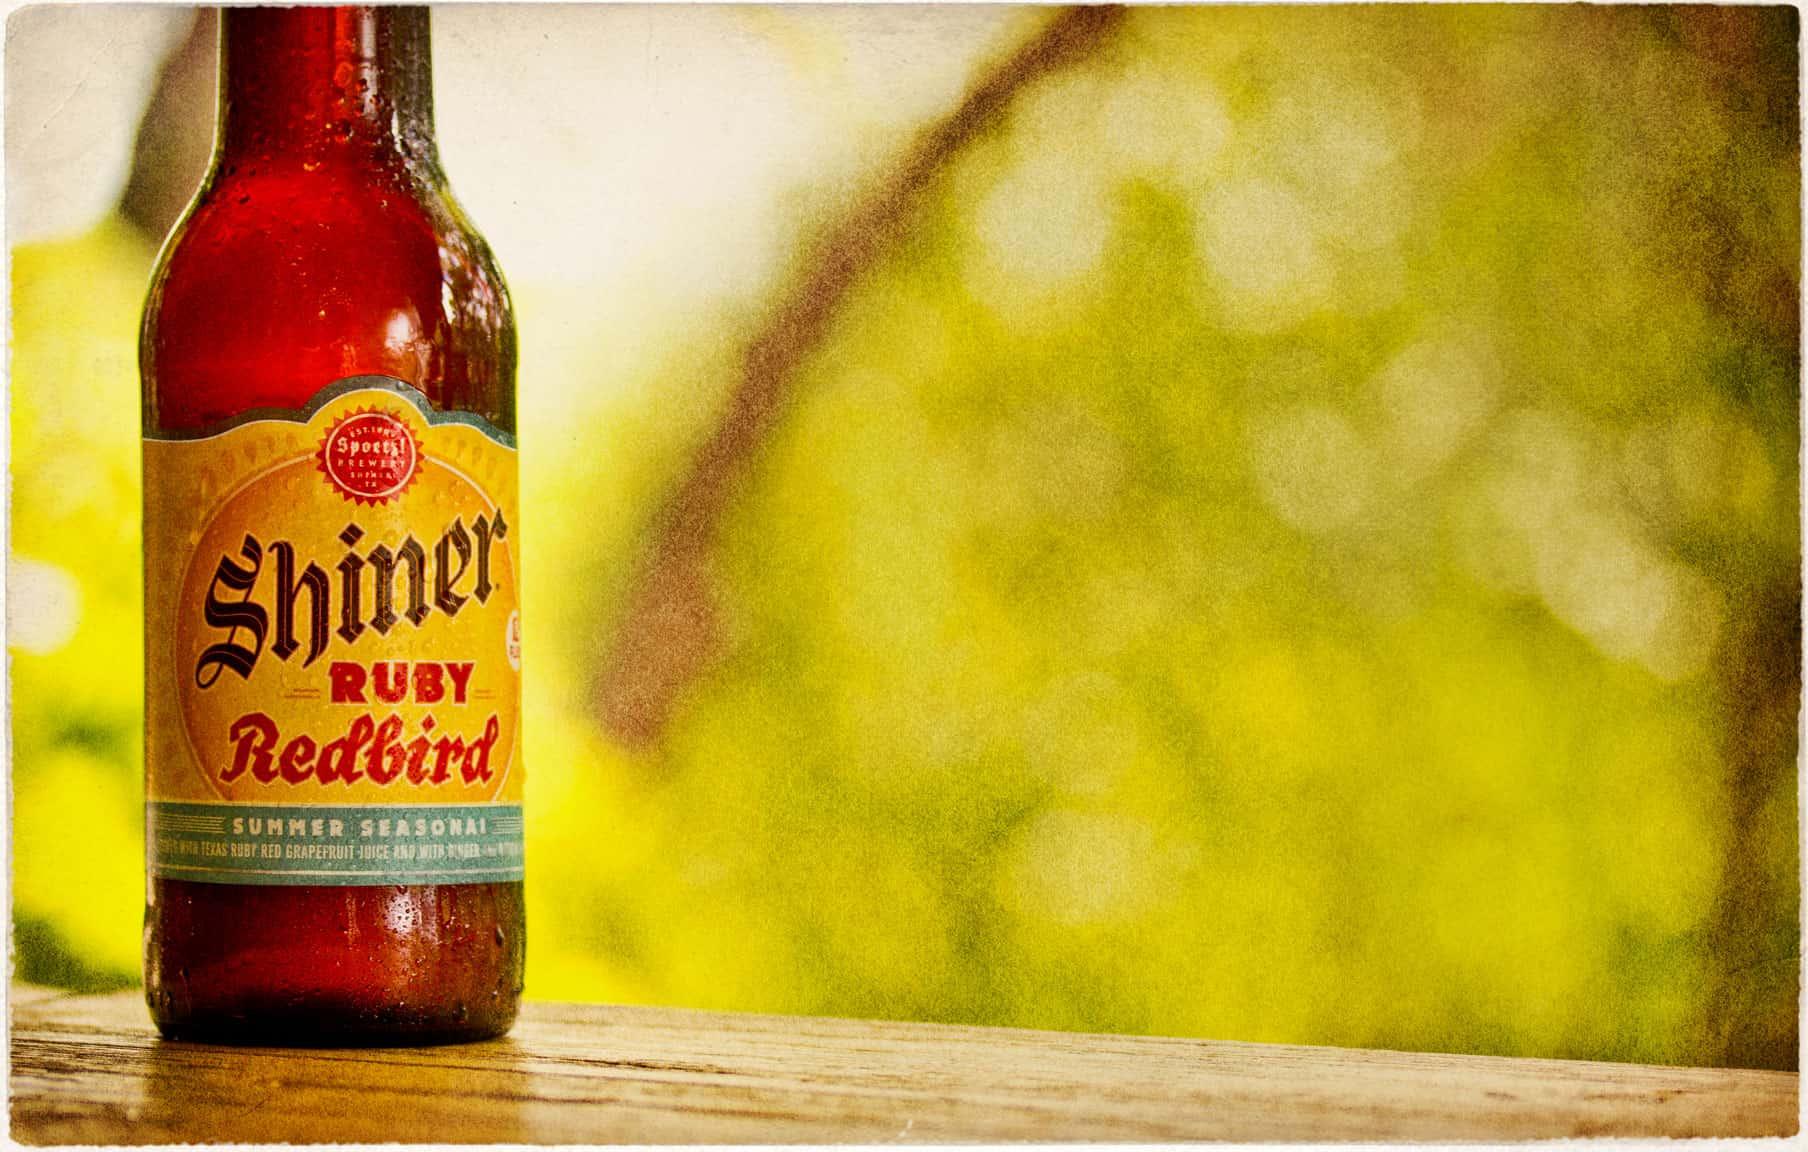 Shiner Ruby Redbird – shower beer